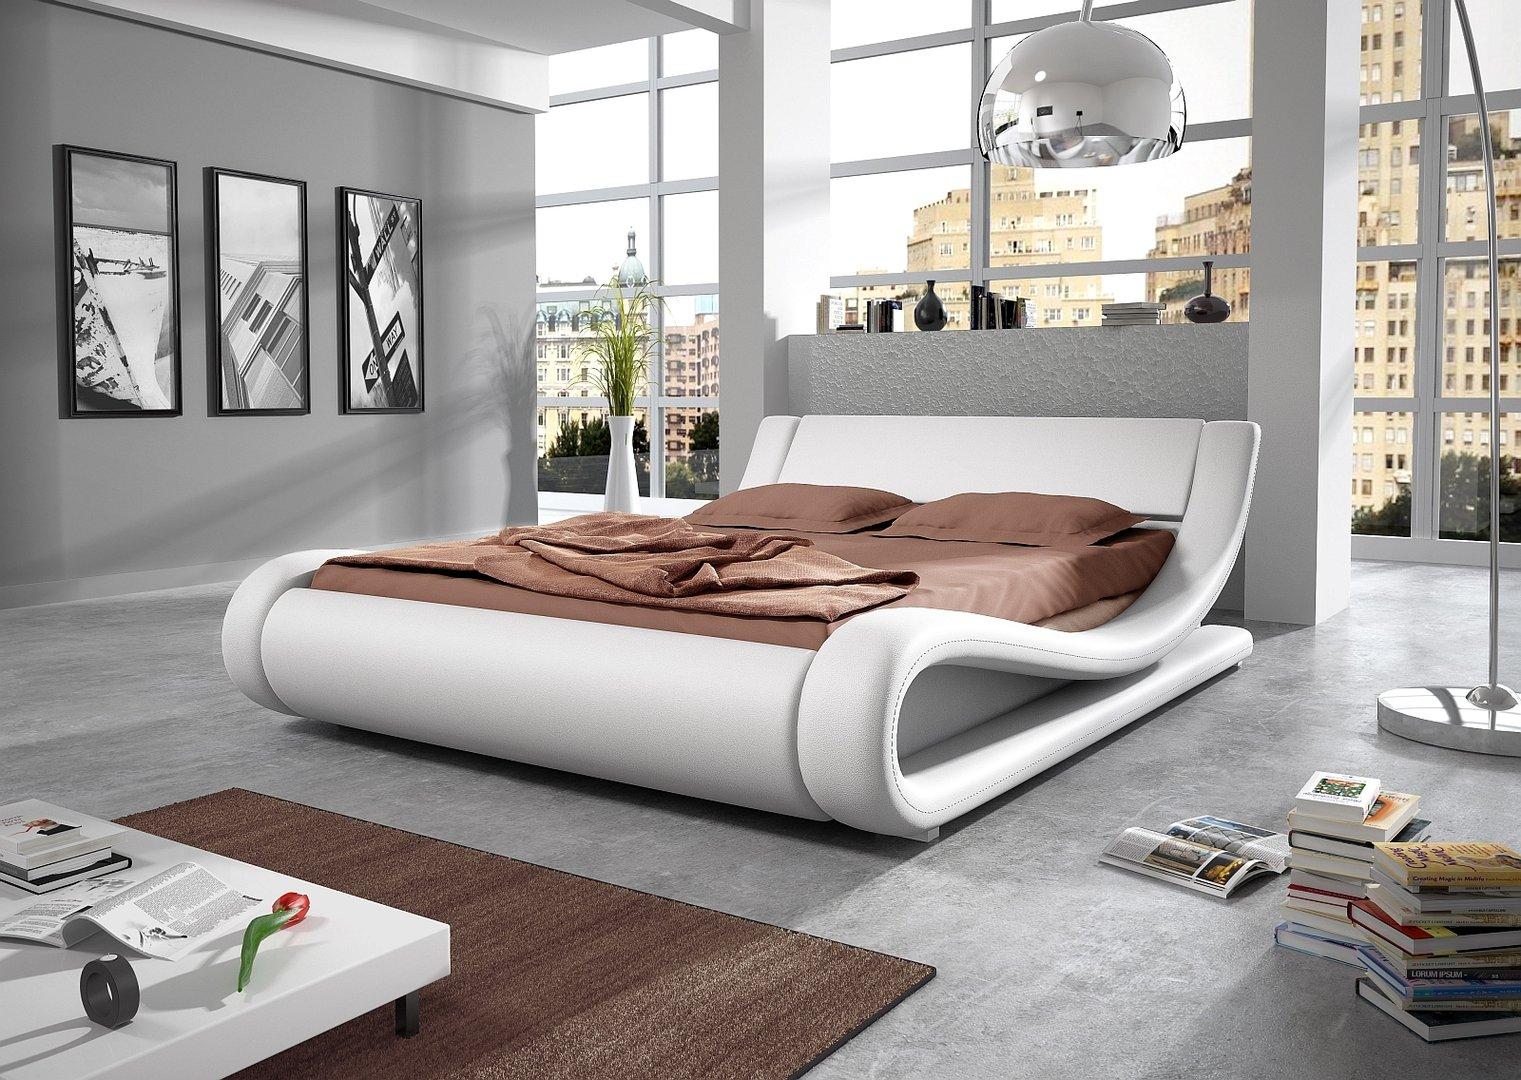 112 most unique bedroom design ideas for low space - Arch12O.com